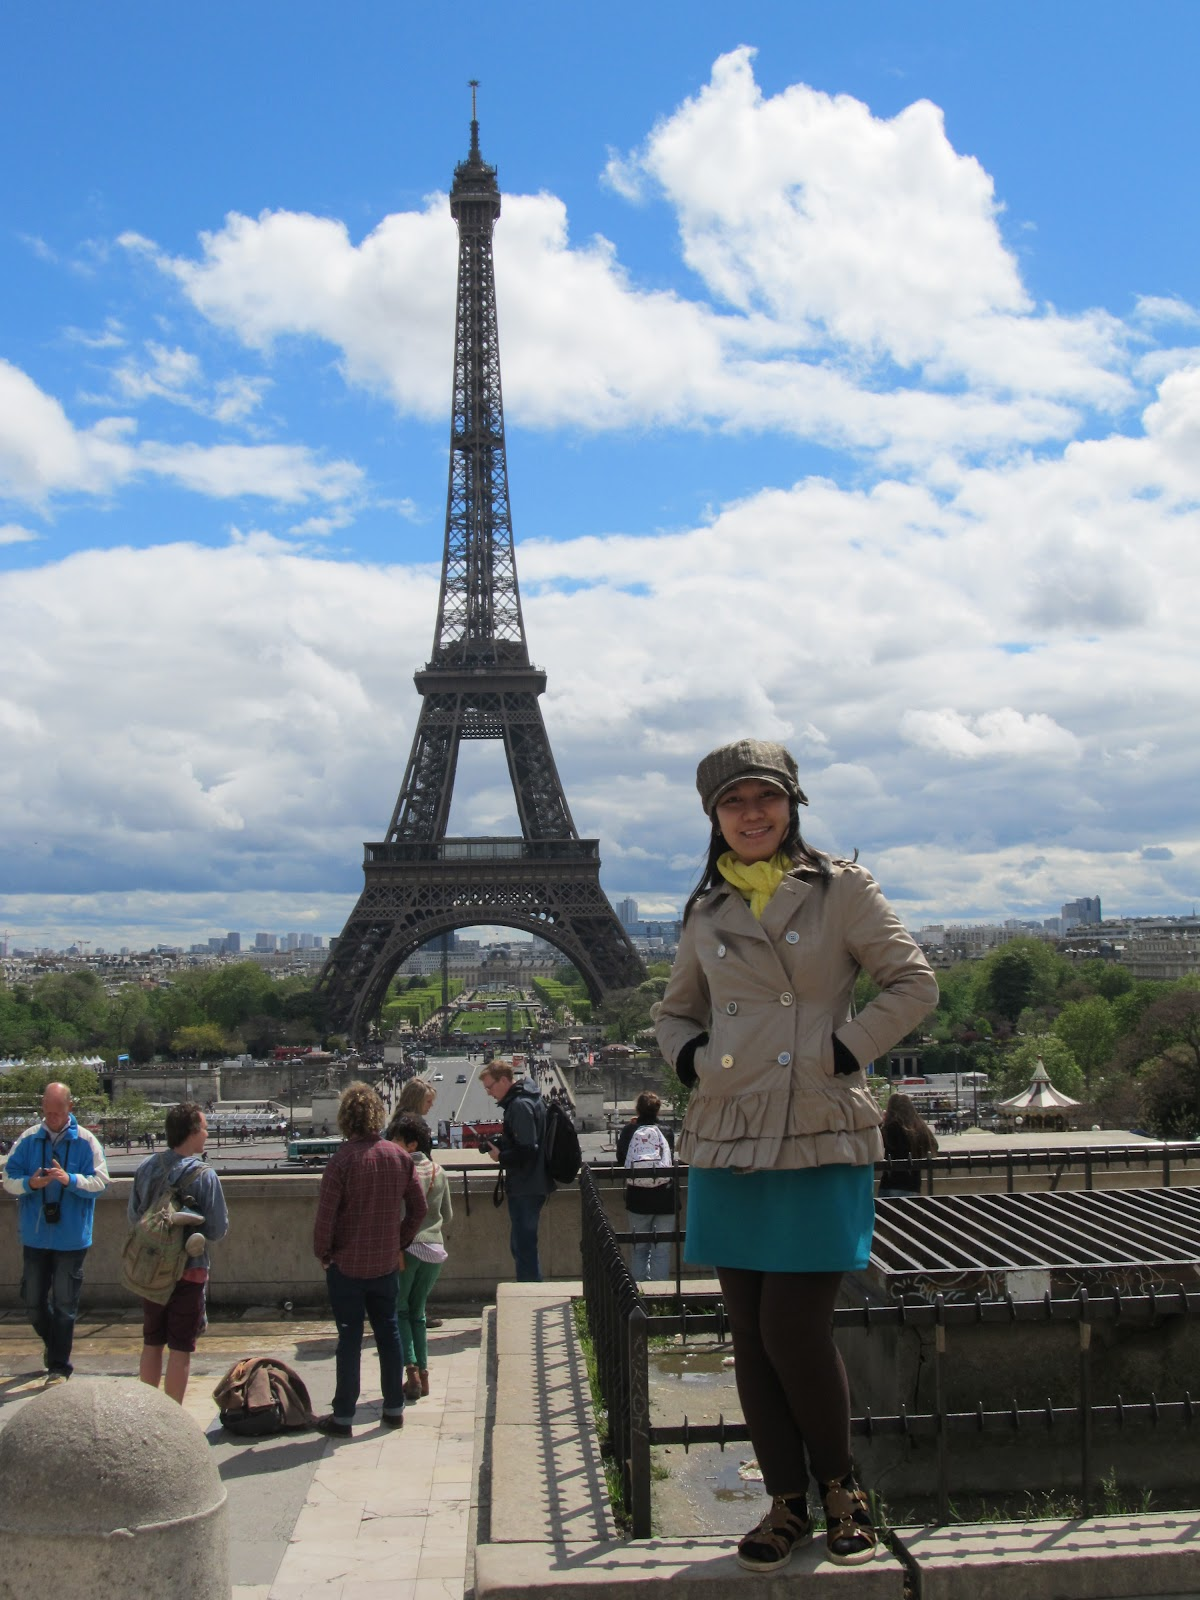 Paris France Eiffel Tower from Trocadéro